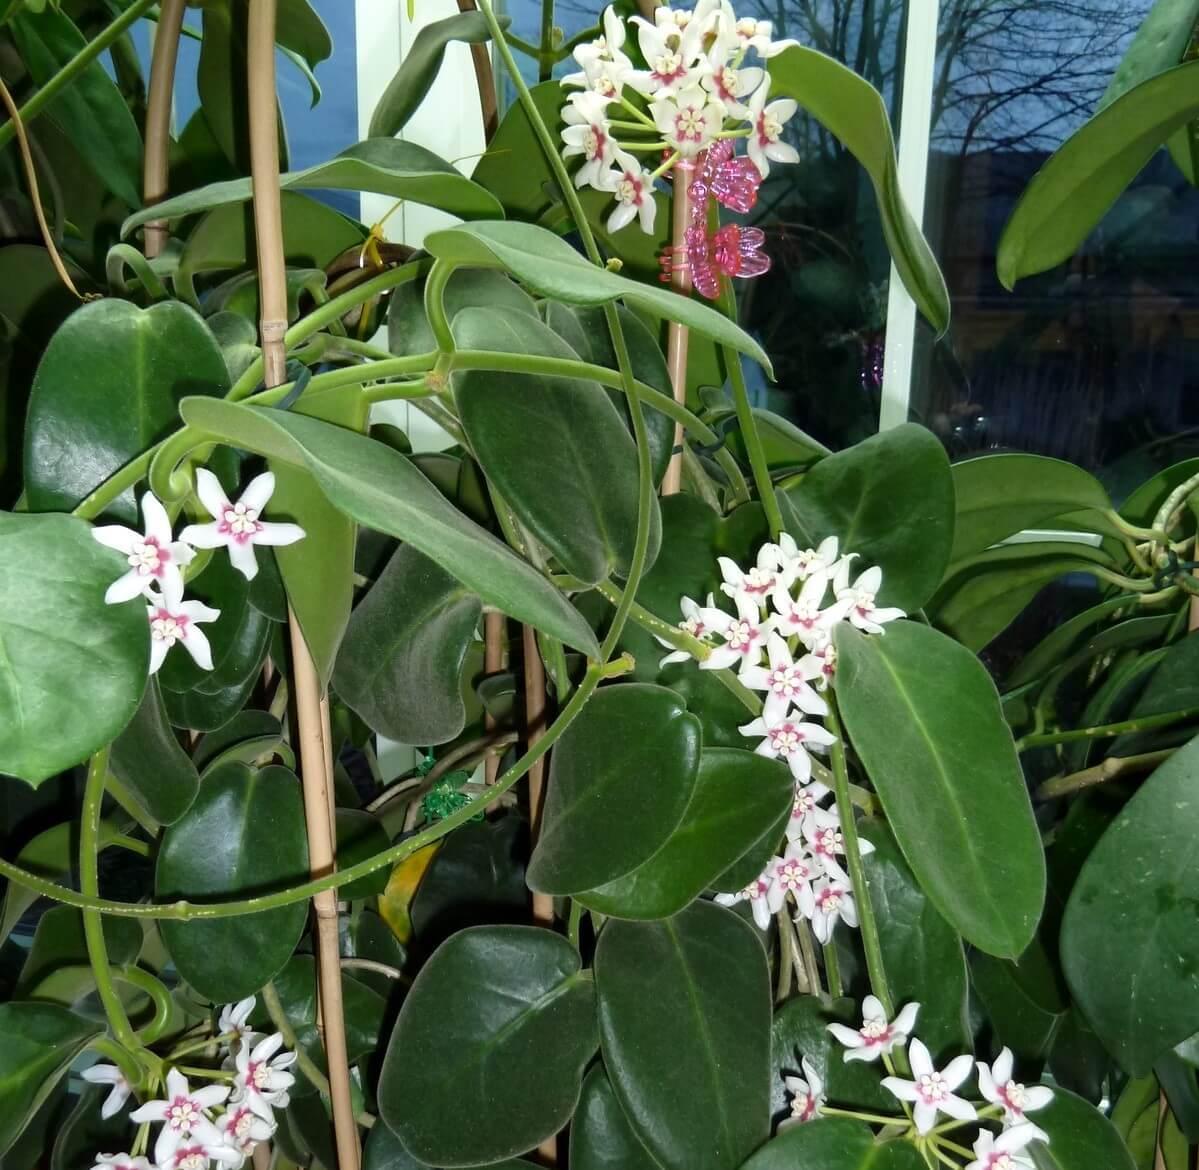 Hoya calycina